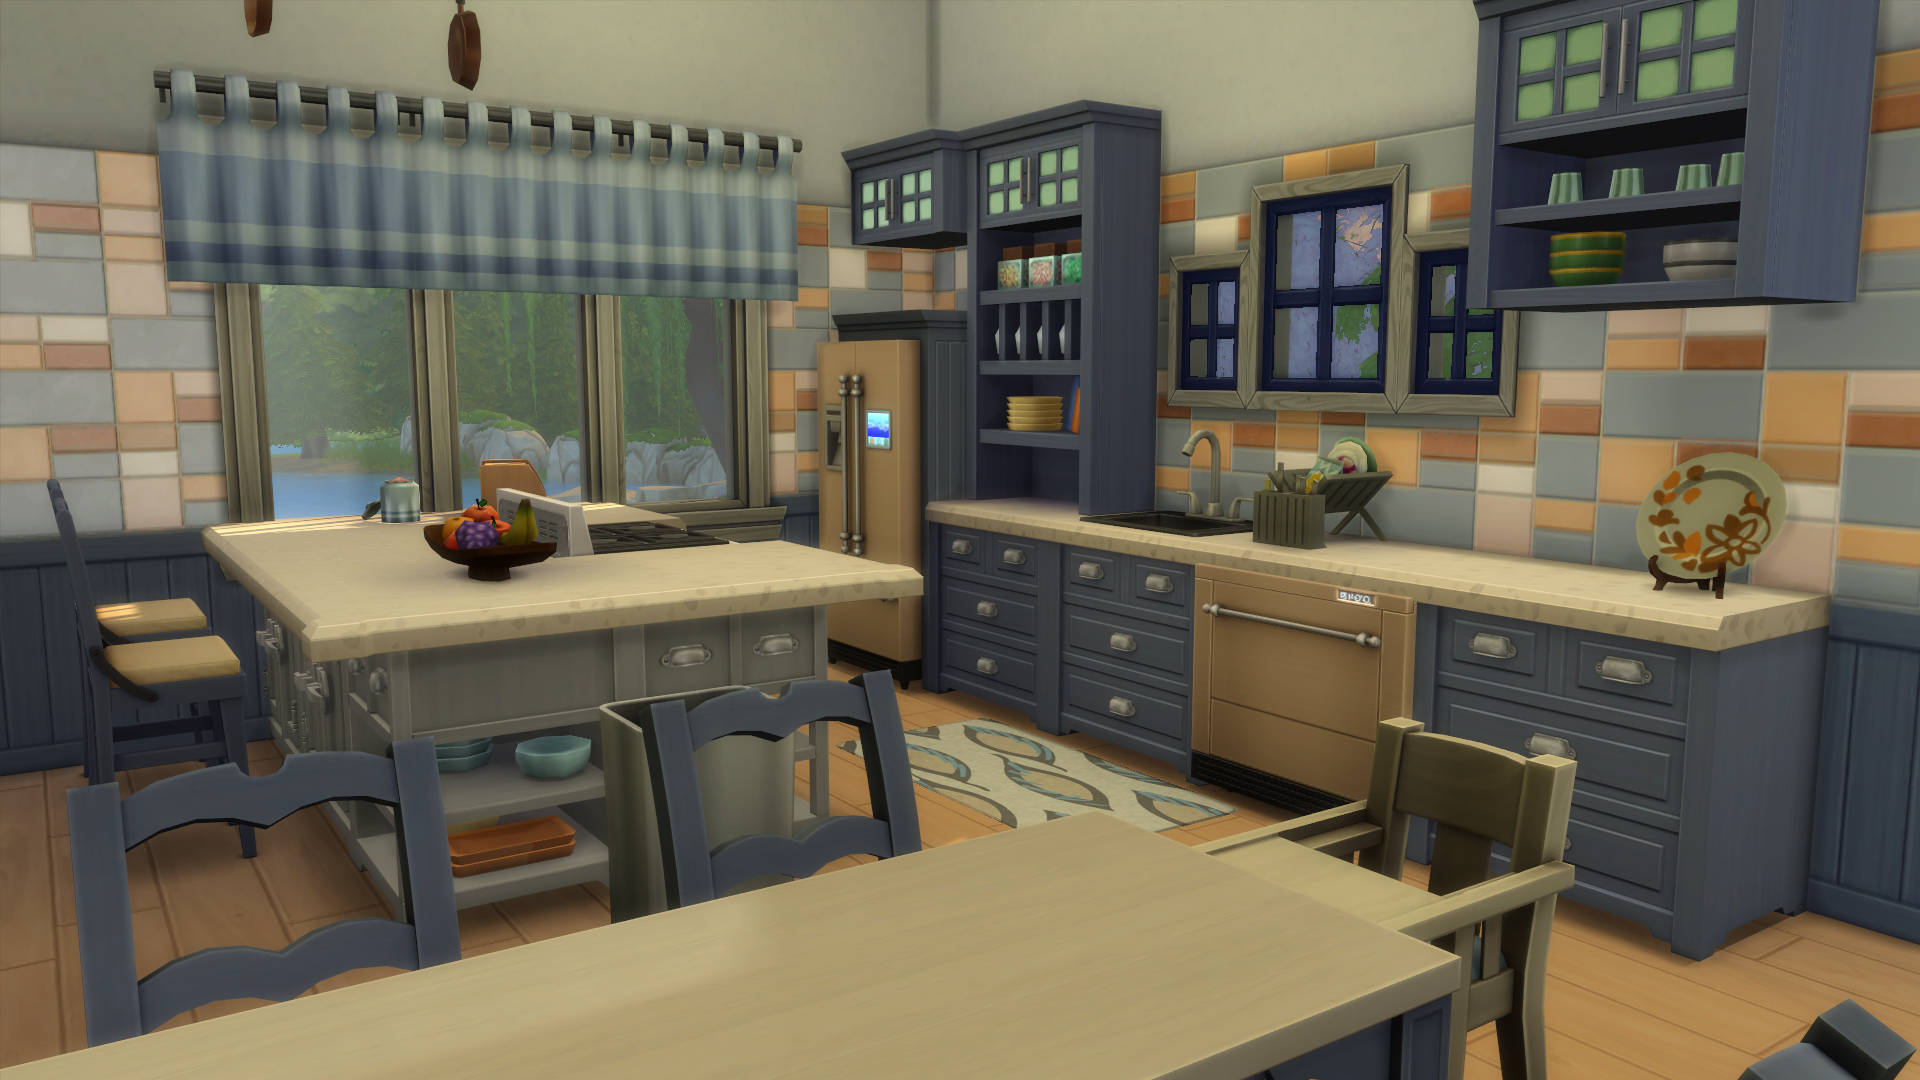 Sn review de sims 4 ouderschap sims nieuws for Eigen keuken bouwen